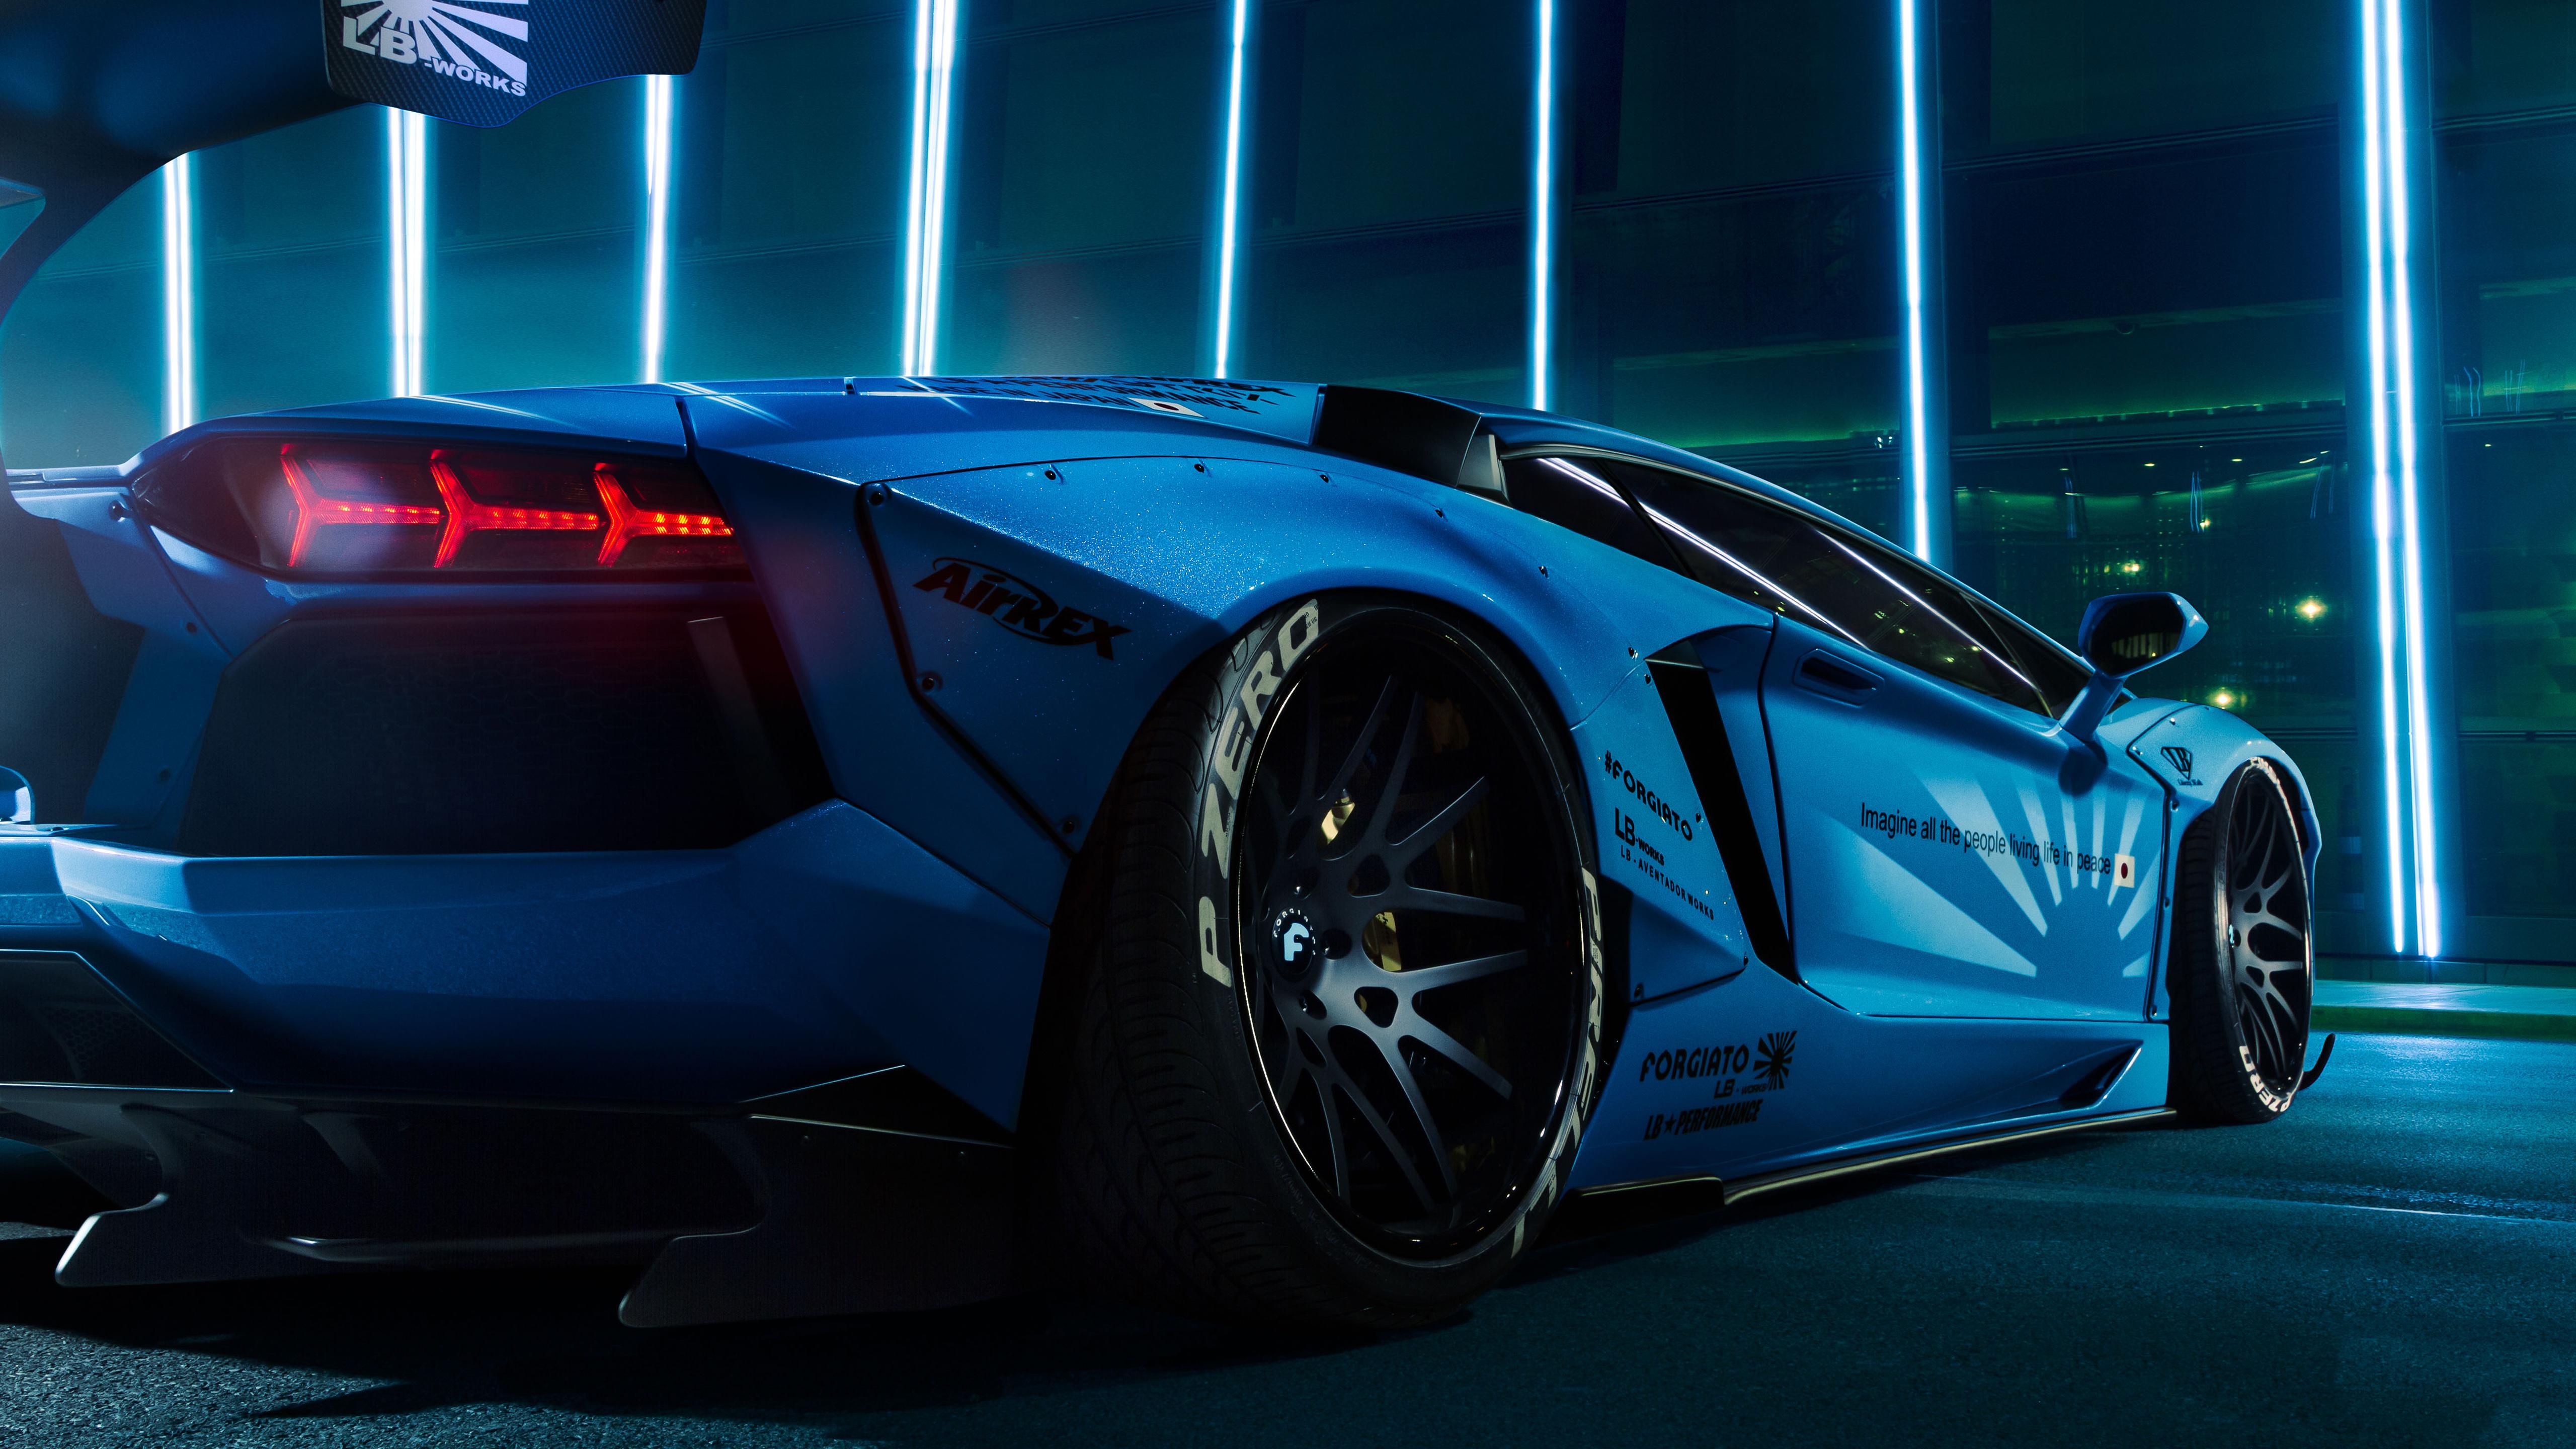 Cool Anime Wallpaper 3d Lamborghini Aventador Lb Performance 5k Wallpapers Hd